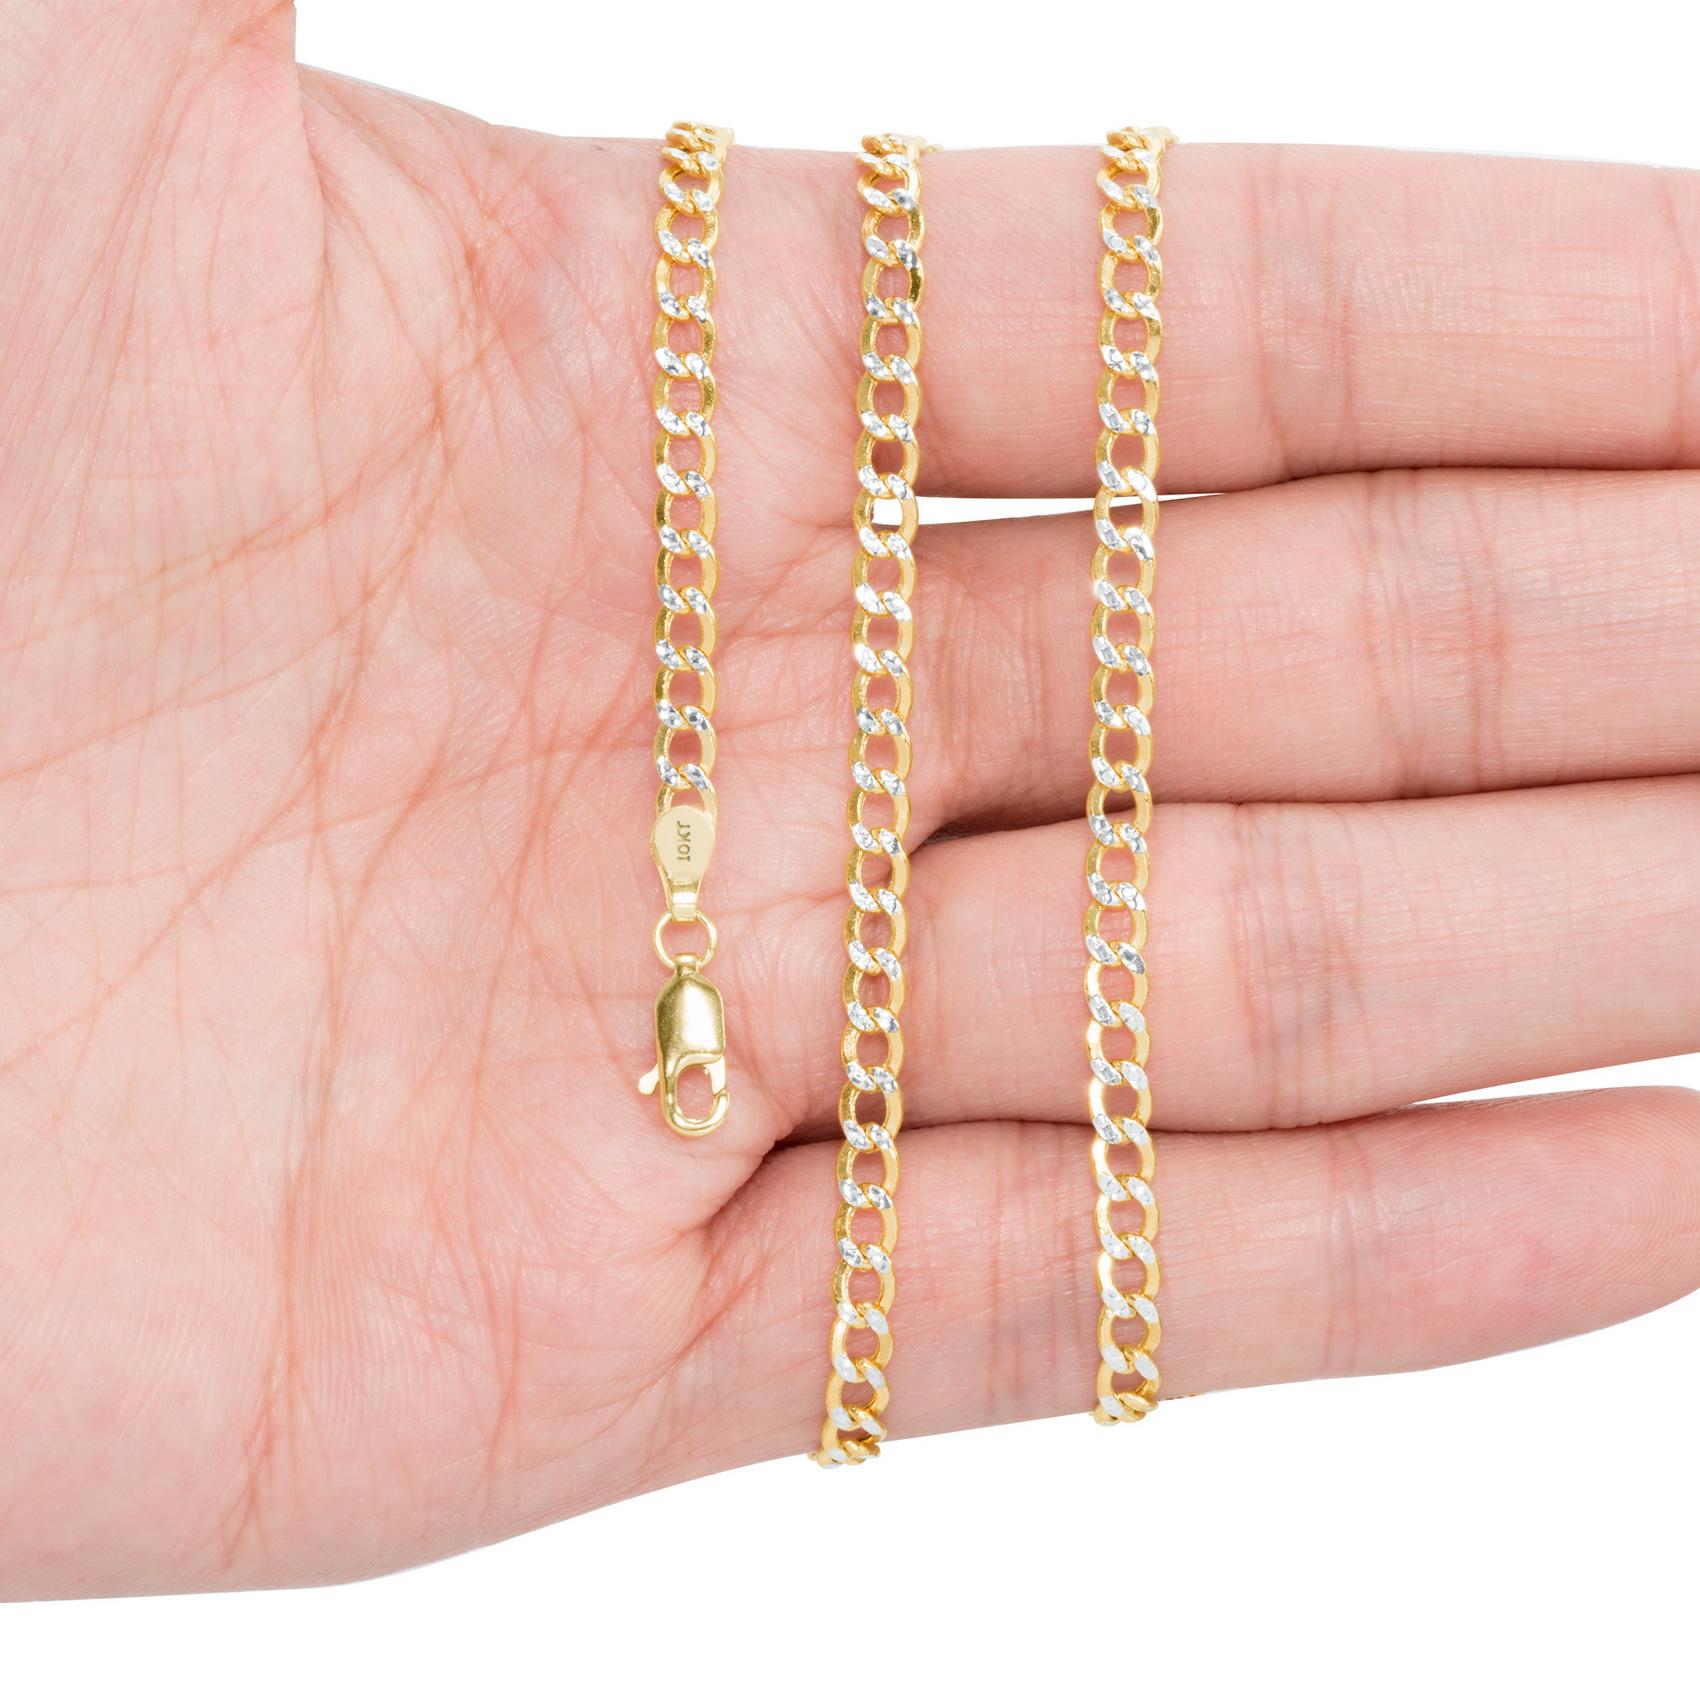 10K-Yellow-Gold-2mm-10-5mm-Diamond-Cut-Pave-Cuban-Chain-Necklace-Bracelet-7-034-30-034 thumbnail 17